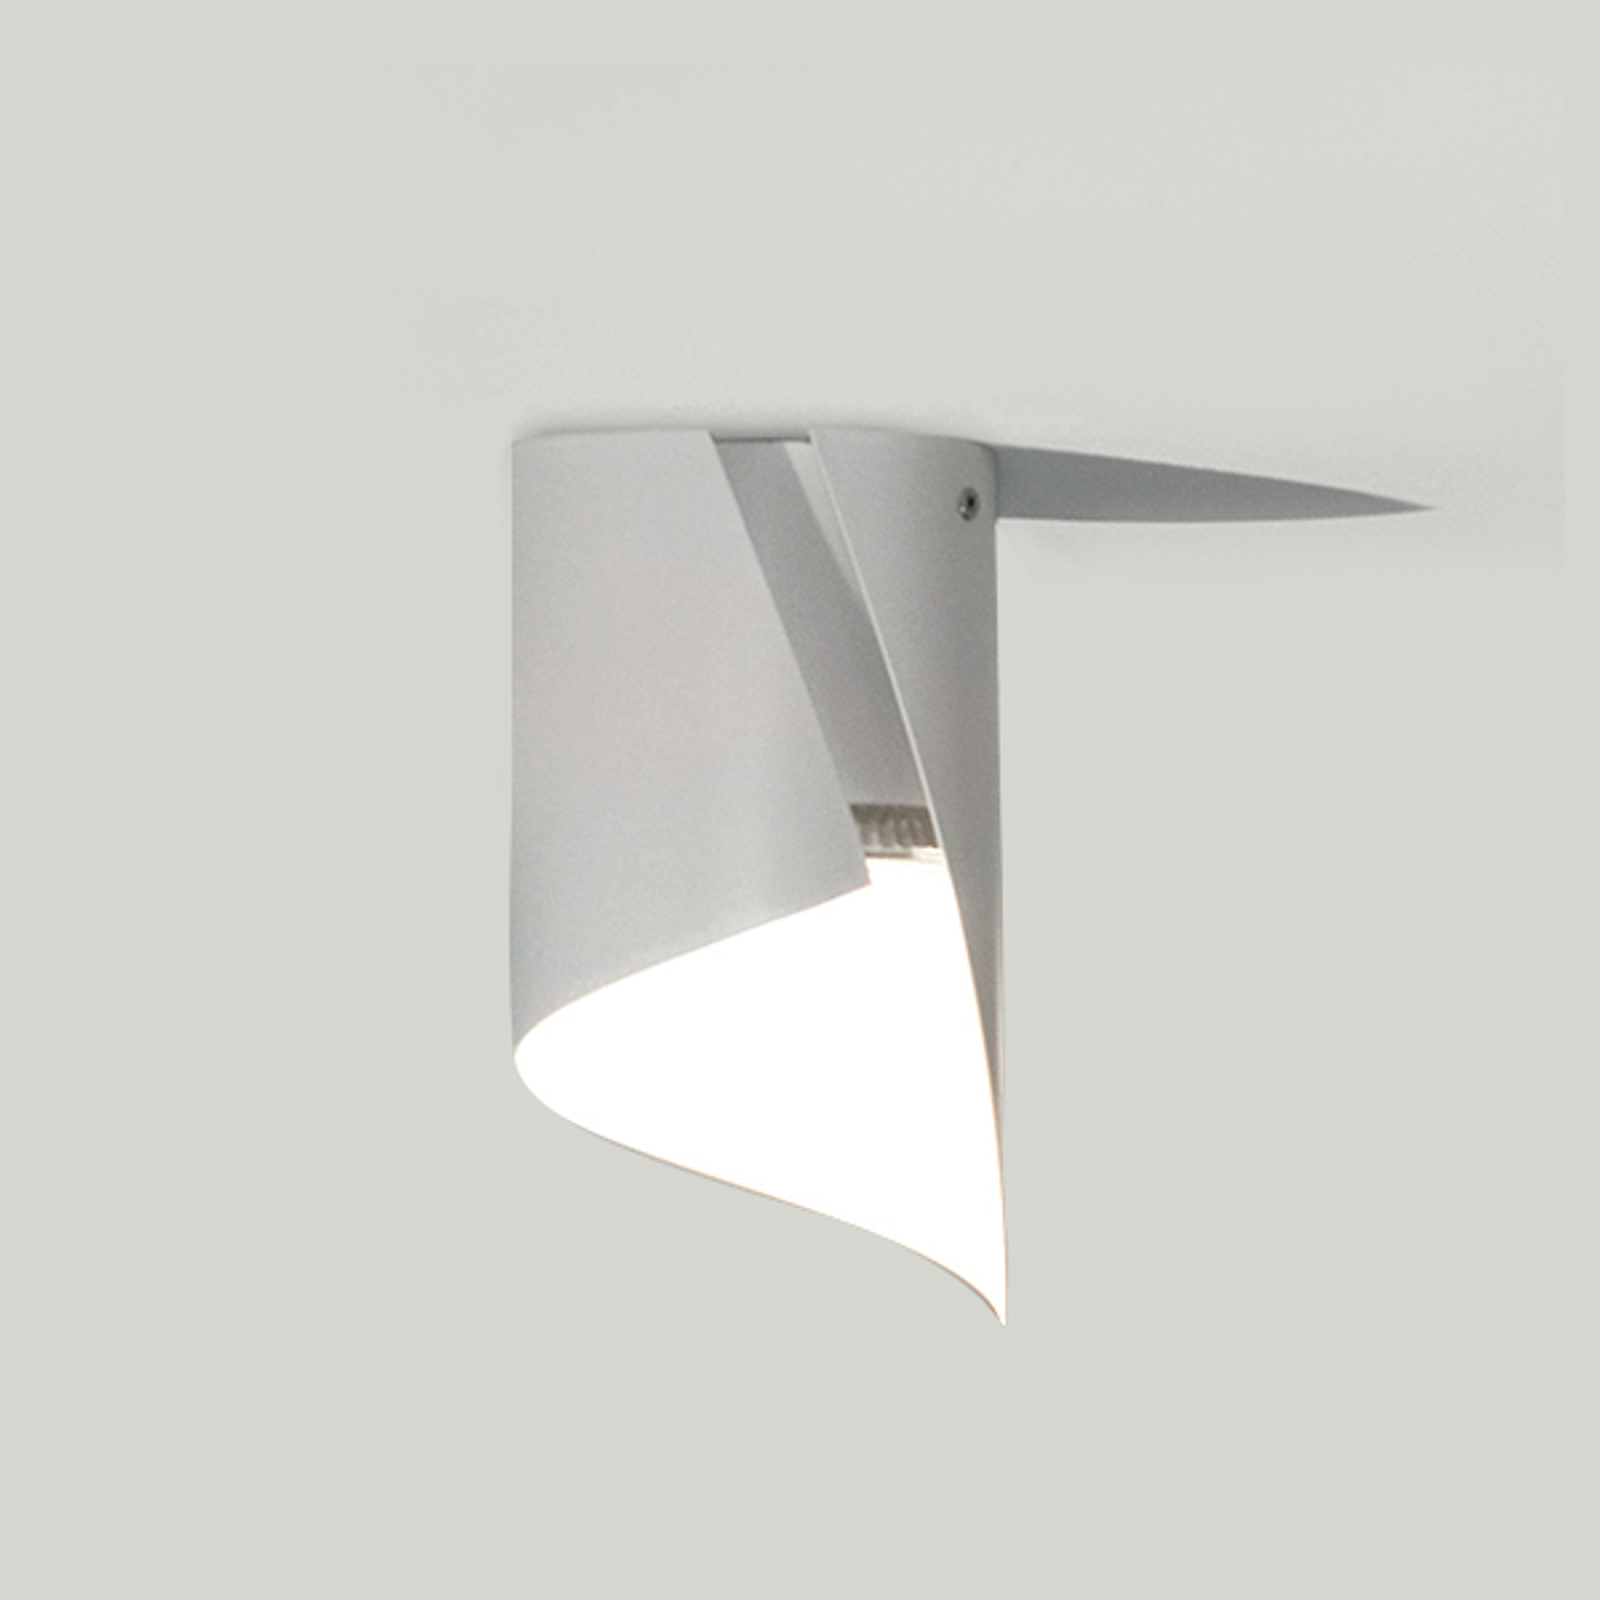 Knikerboker Hué lampa sufitowa LED 8x15cm biała